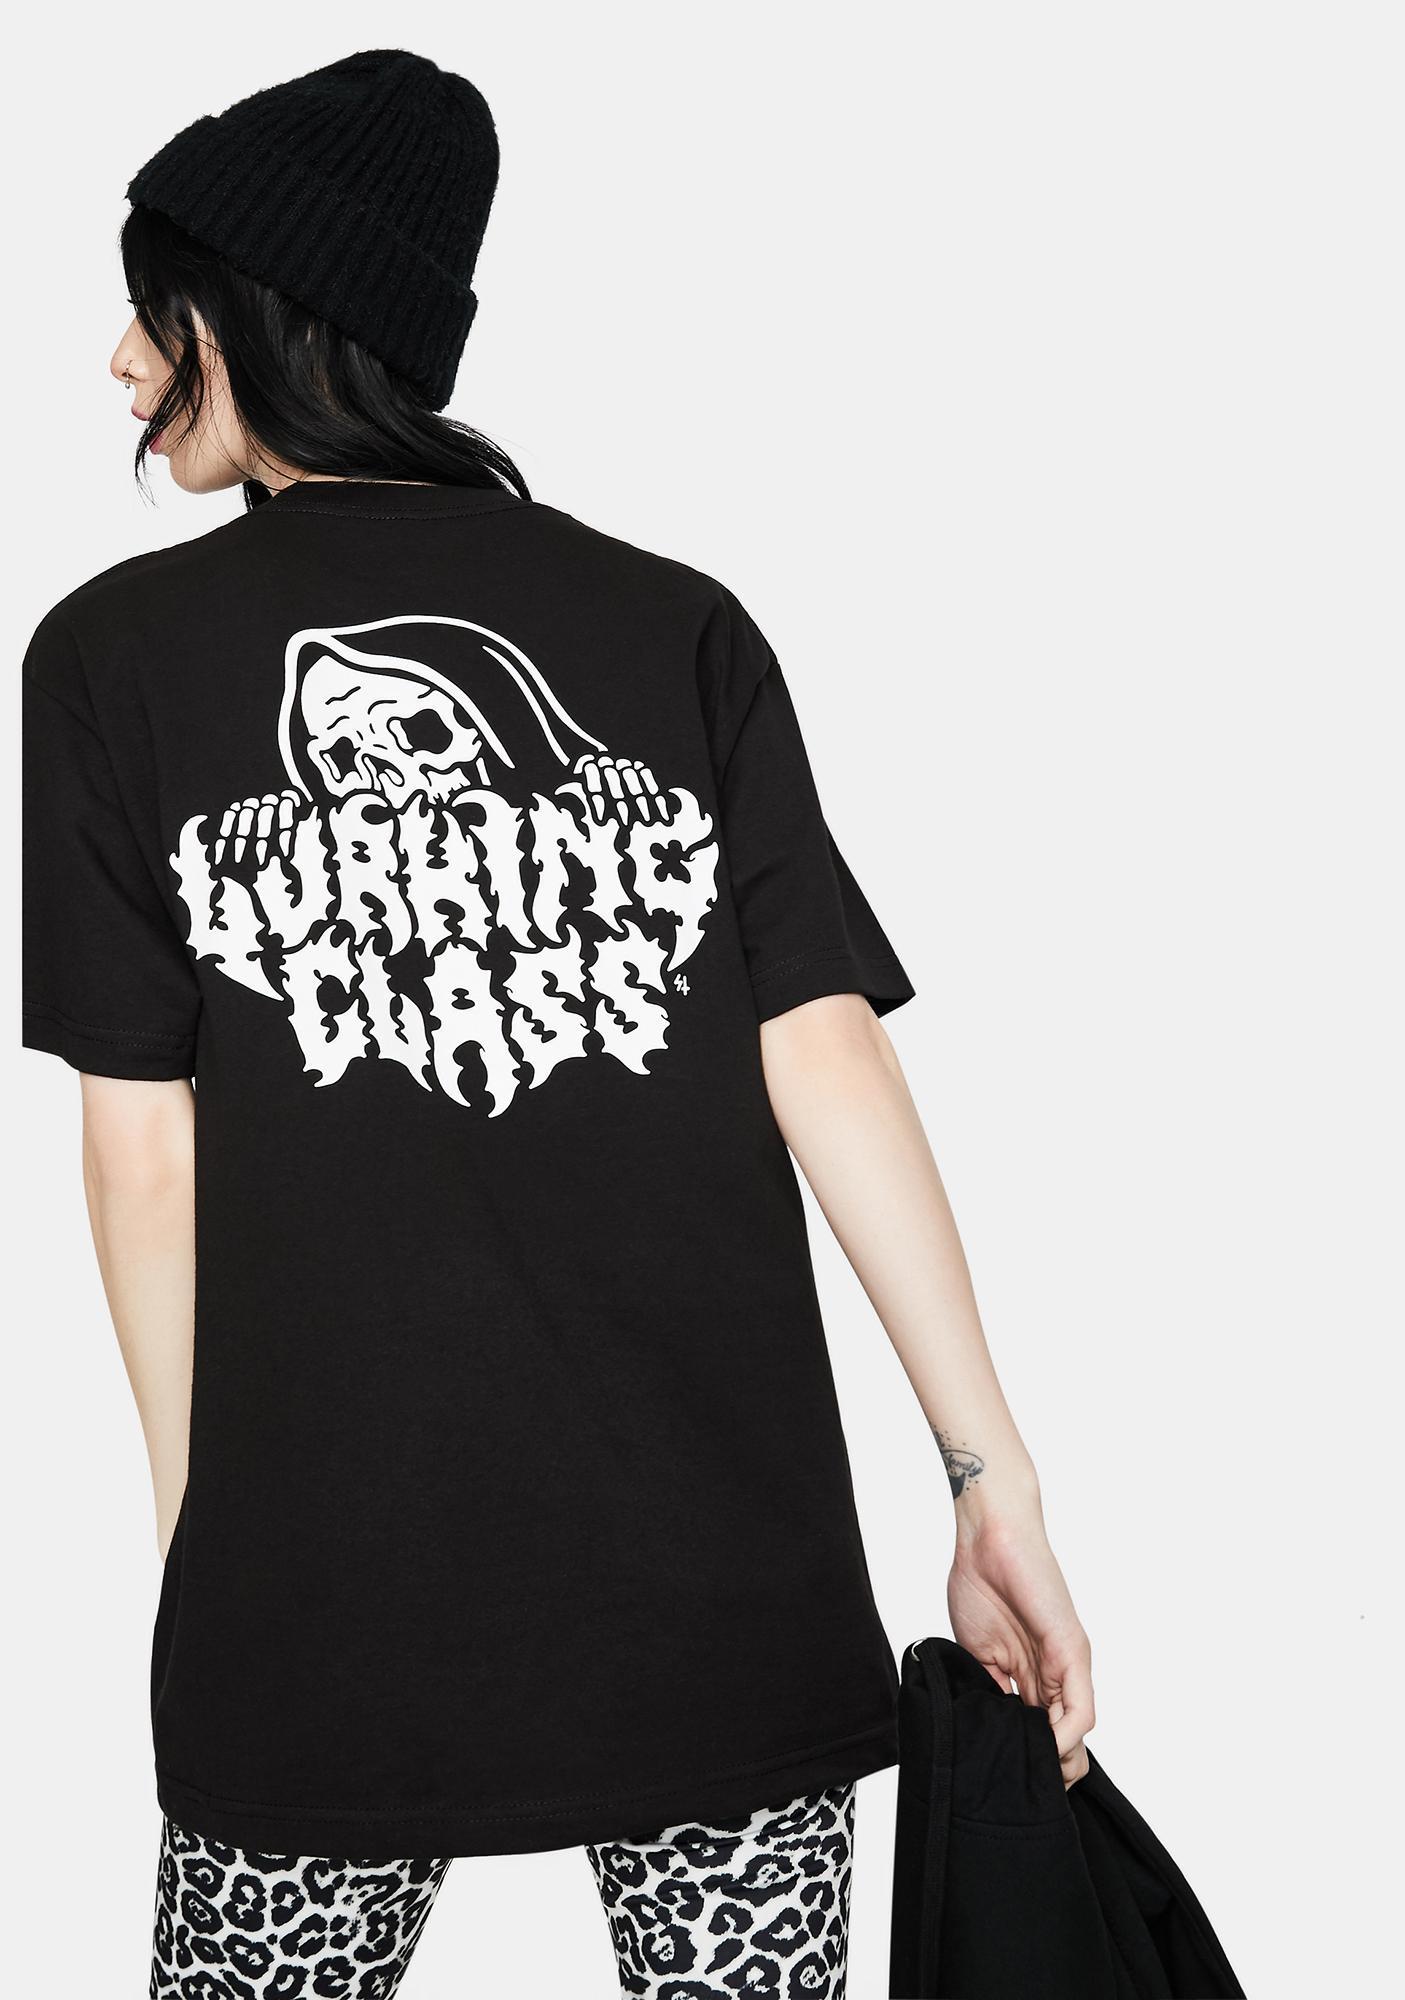 Lurking Class Reaper Graphic Tee